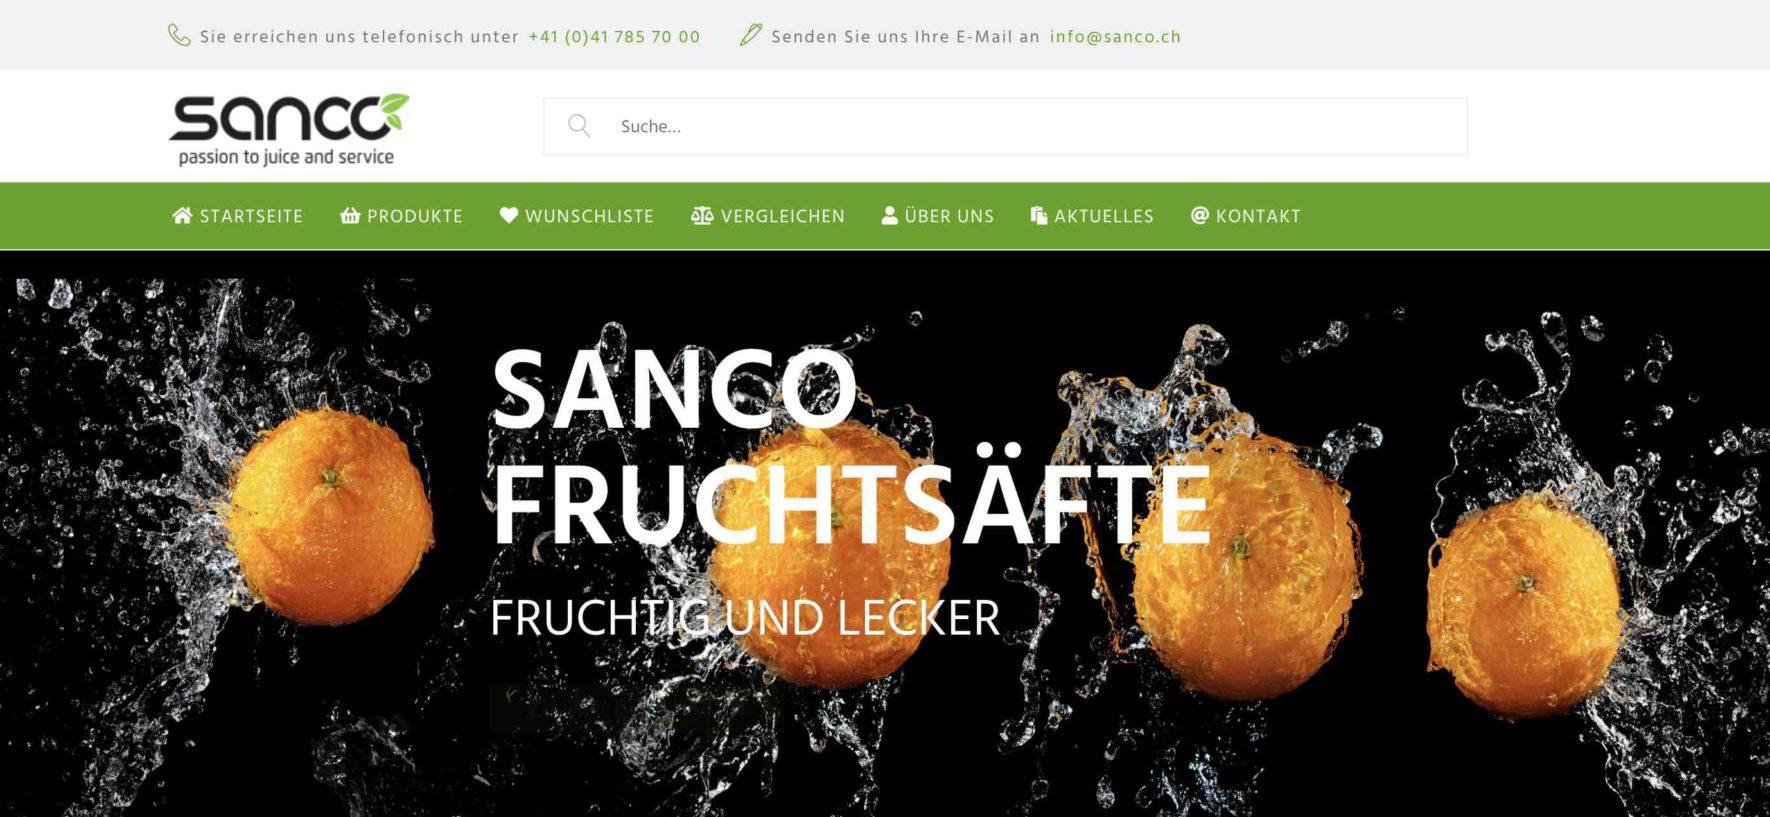 Sanco AG mit neuer Internetpräsenz DE